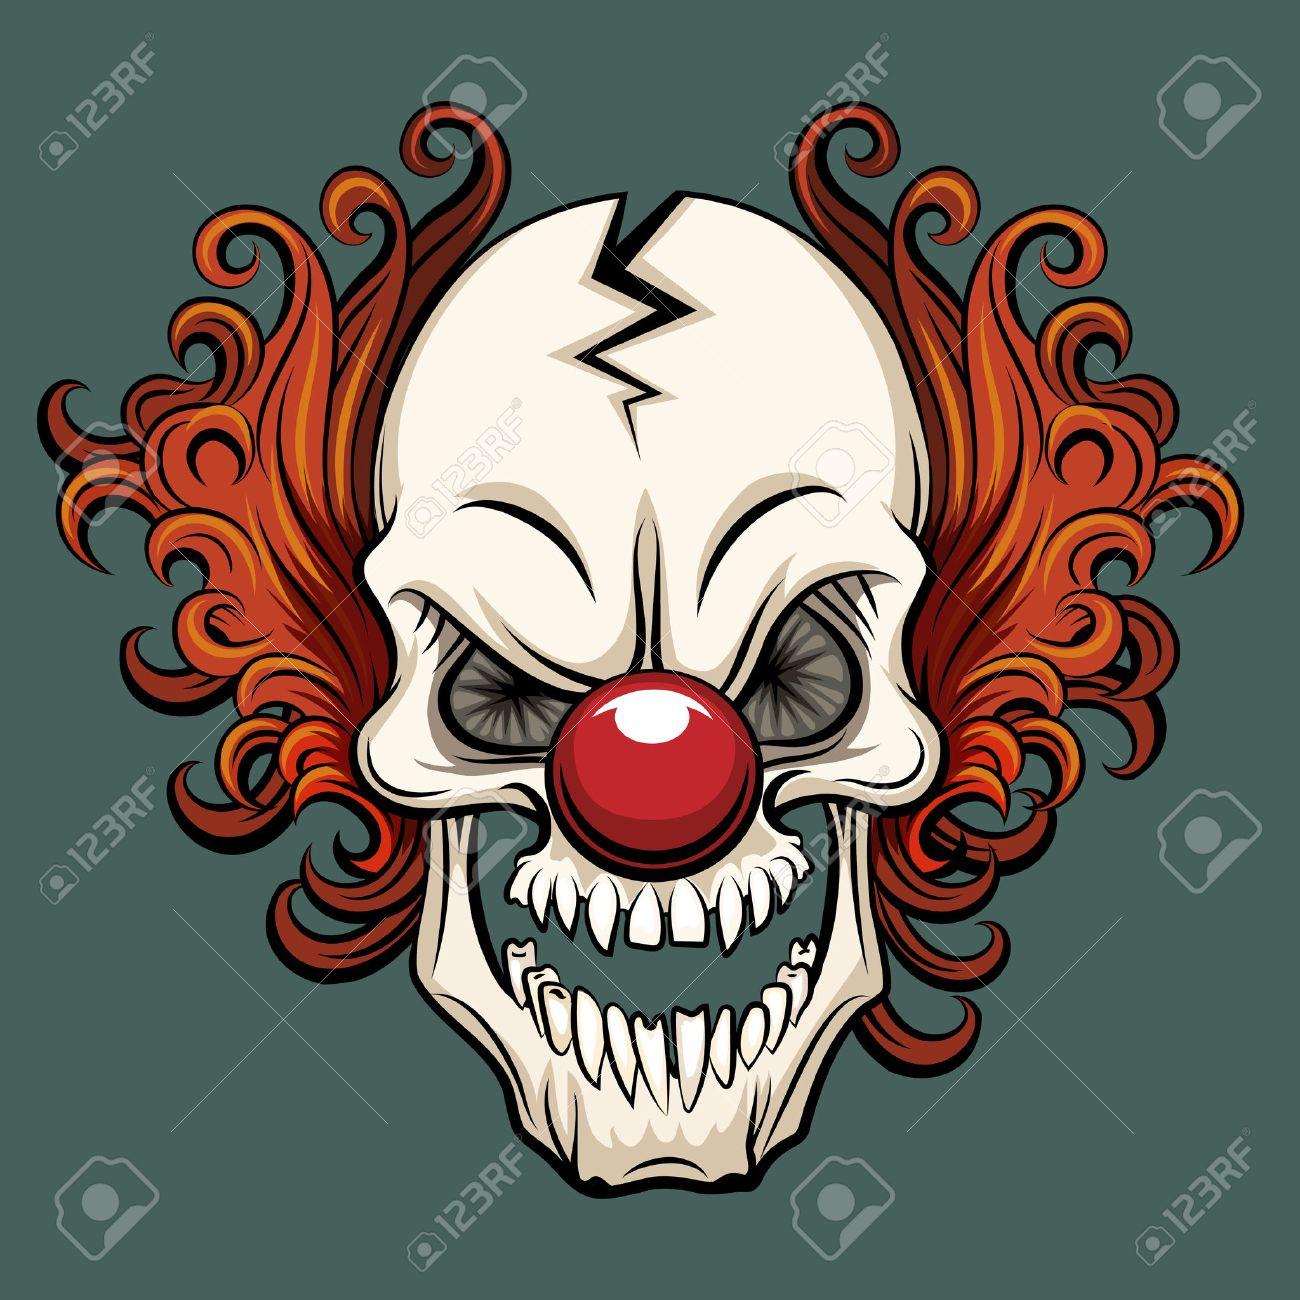 Vector evil clown. Clown scary, halloween clown monster, joker clown character illustration - 55462190